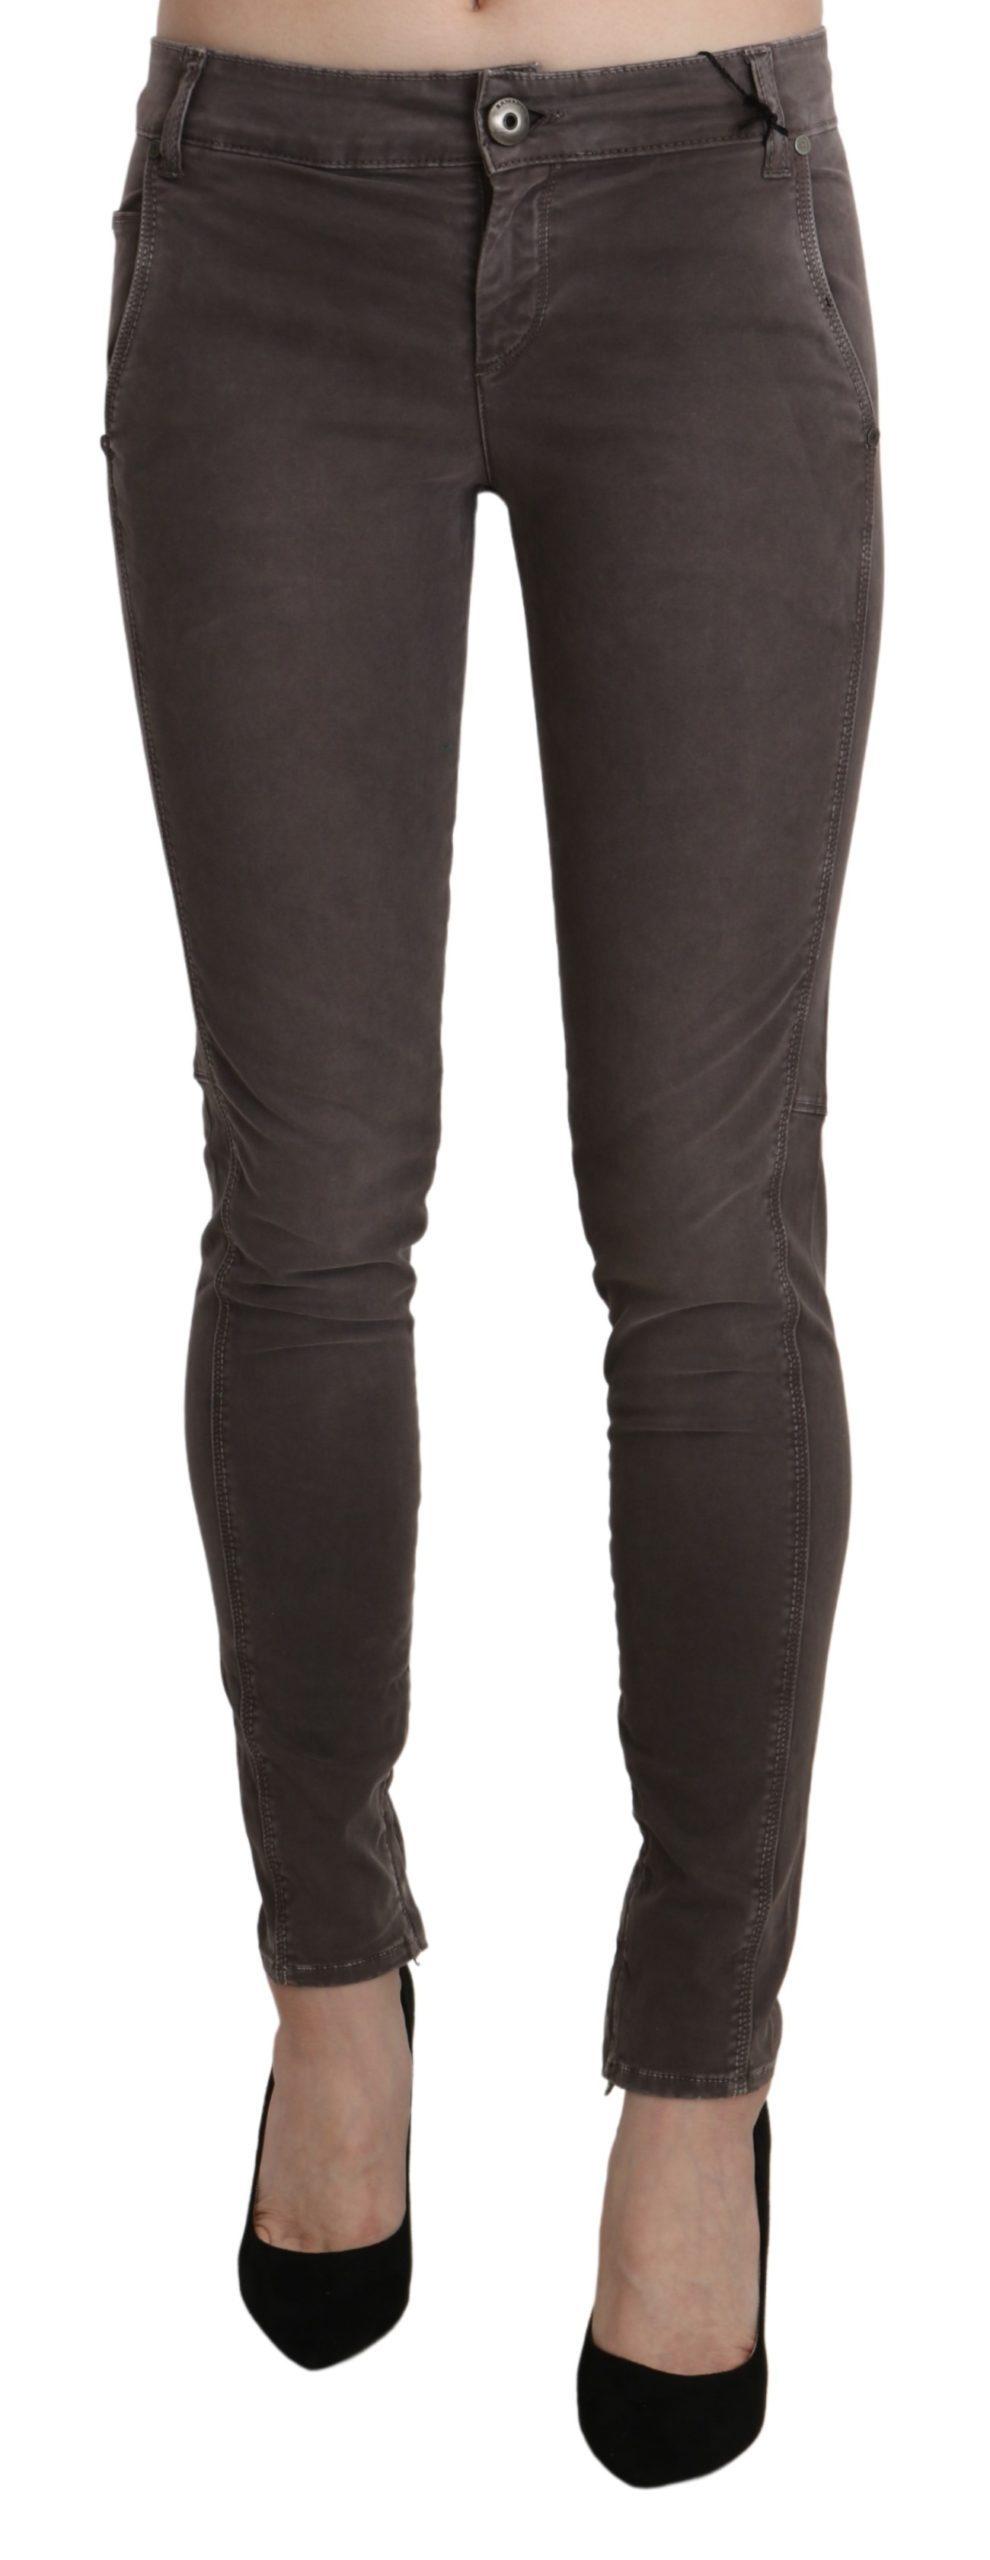 Brown Low Waist Skinny Slim Trouser Cotton Jeans - W26